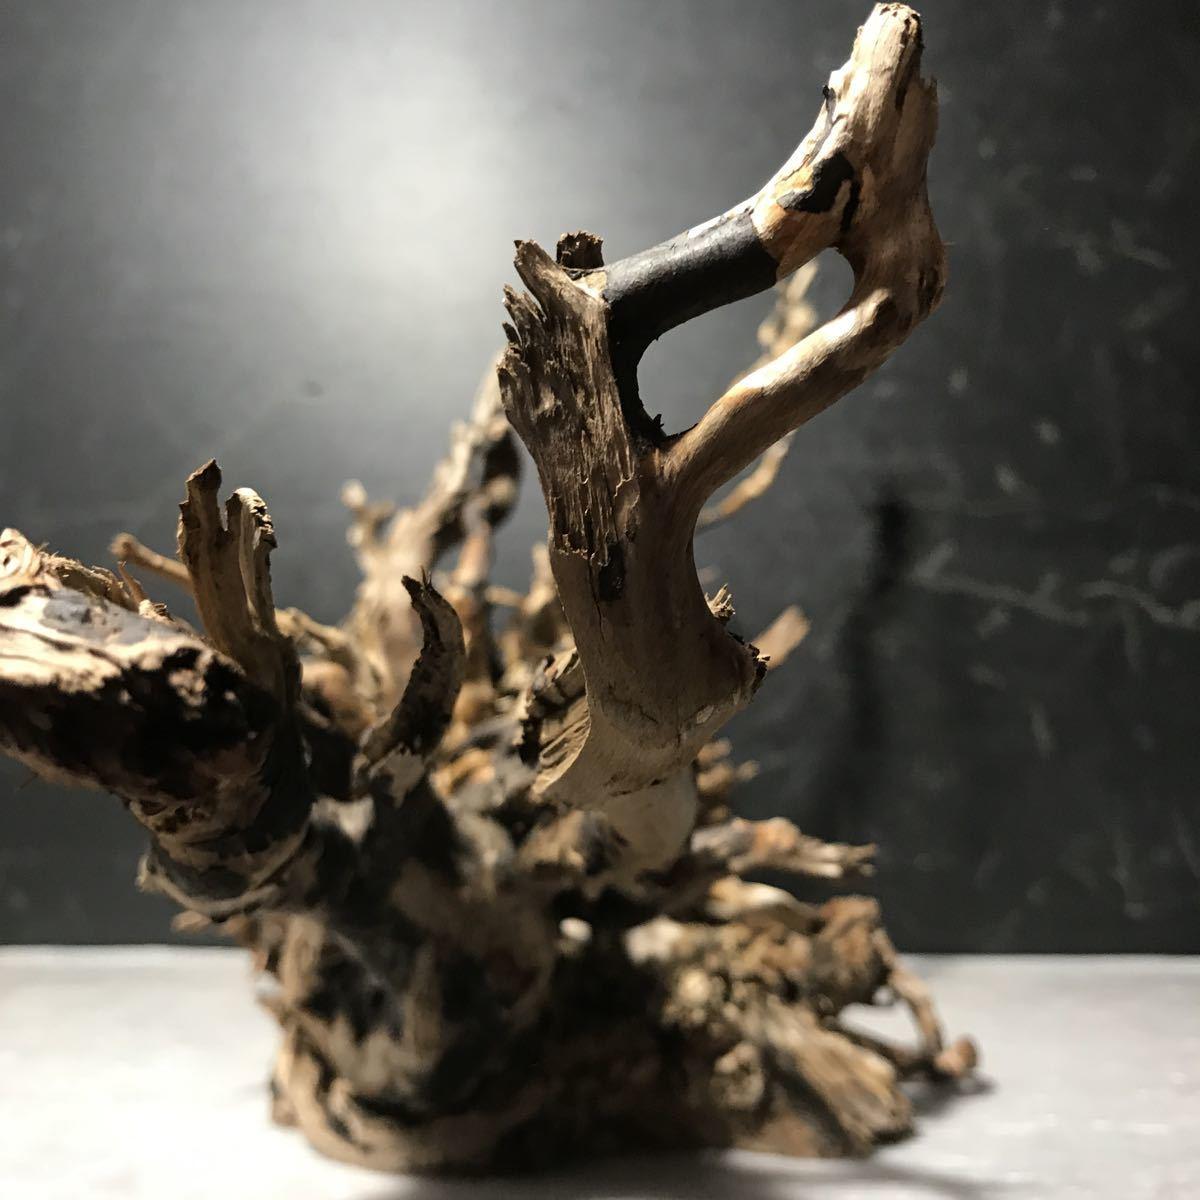 ☆sea tree☆煮沸消毒済み流木 ブランチ流木/水槽/アクアリウム/テラリウム/インテリア/ADA/サンゴ/置物_画像4